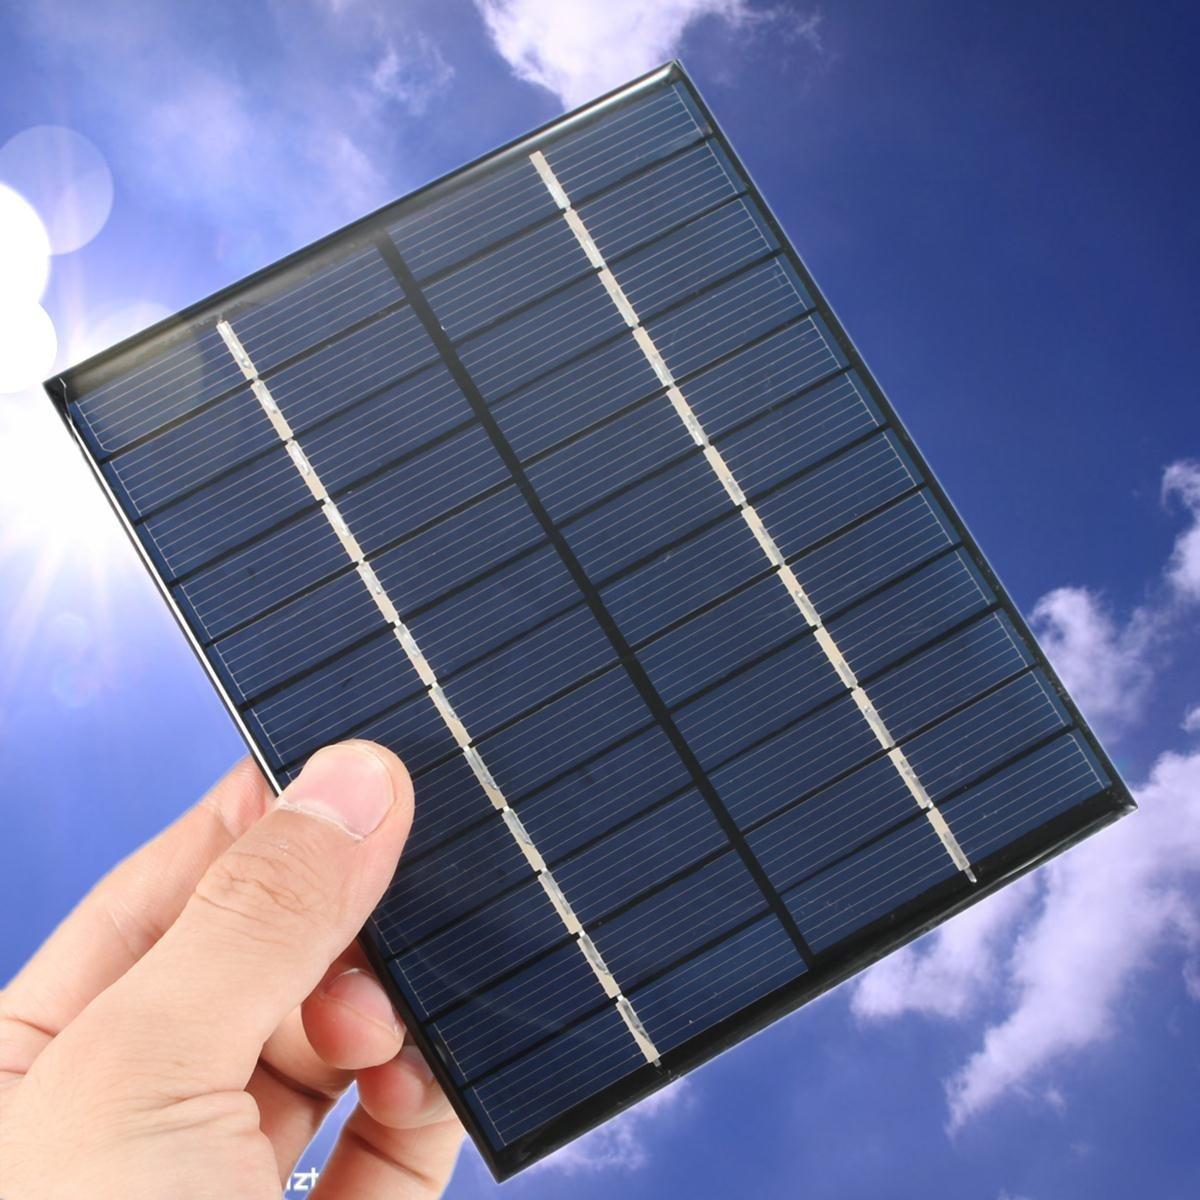 KINCO 12V 2W Solar Panel 5V Phone Solar Battery Charger 12V Mini DIY Epoxy Polycrystalline Cells For Smartphone Battery